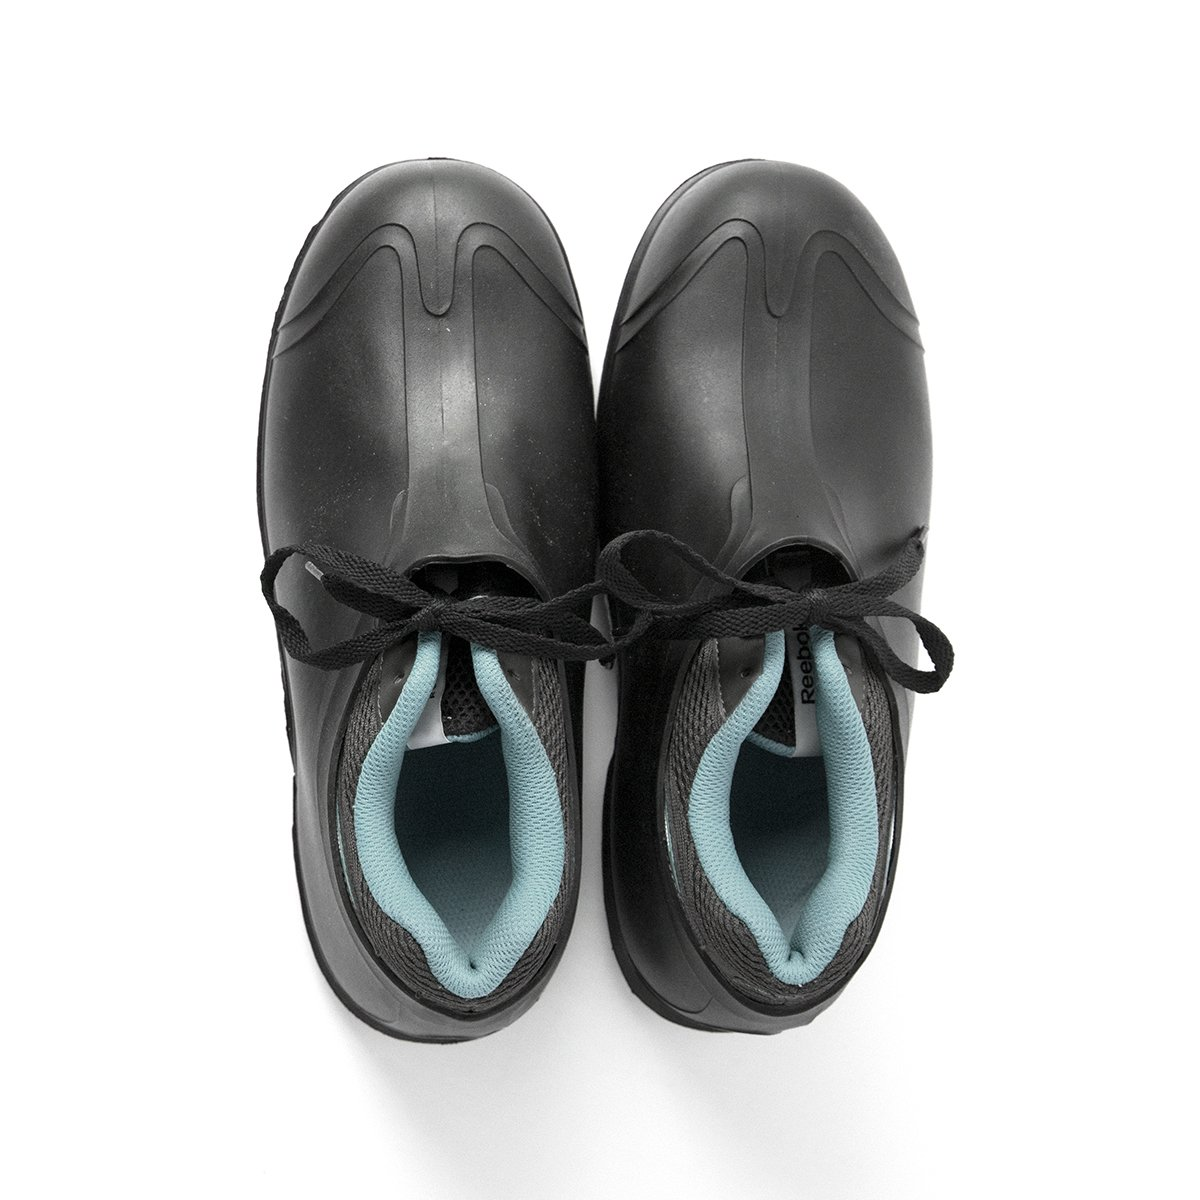 Black Size Medium UltraSource 440095-M PVC Overshoes 8-9 4